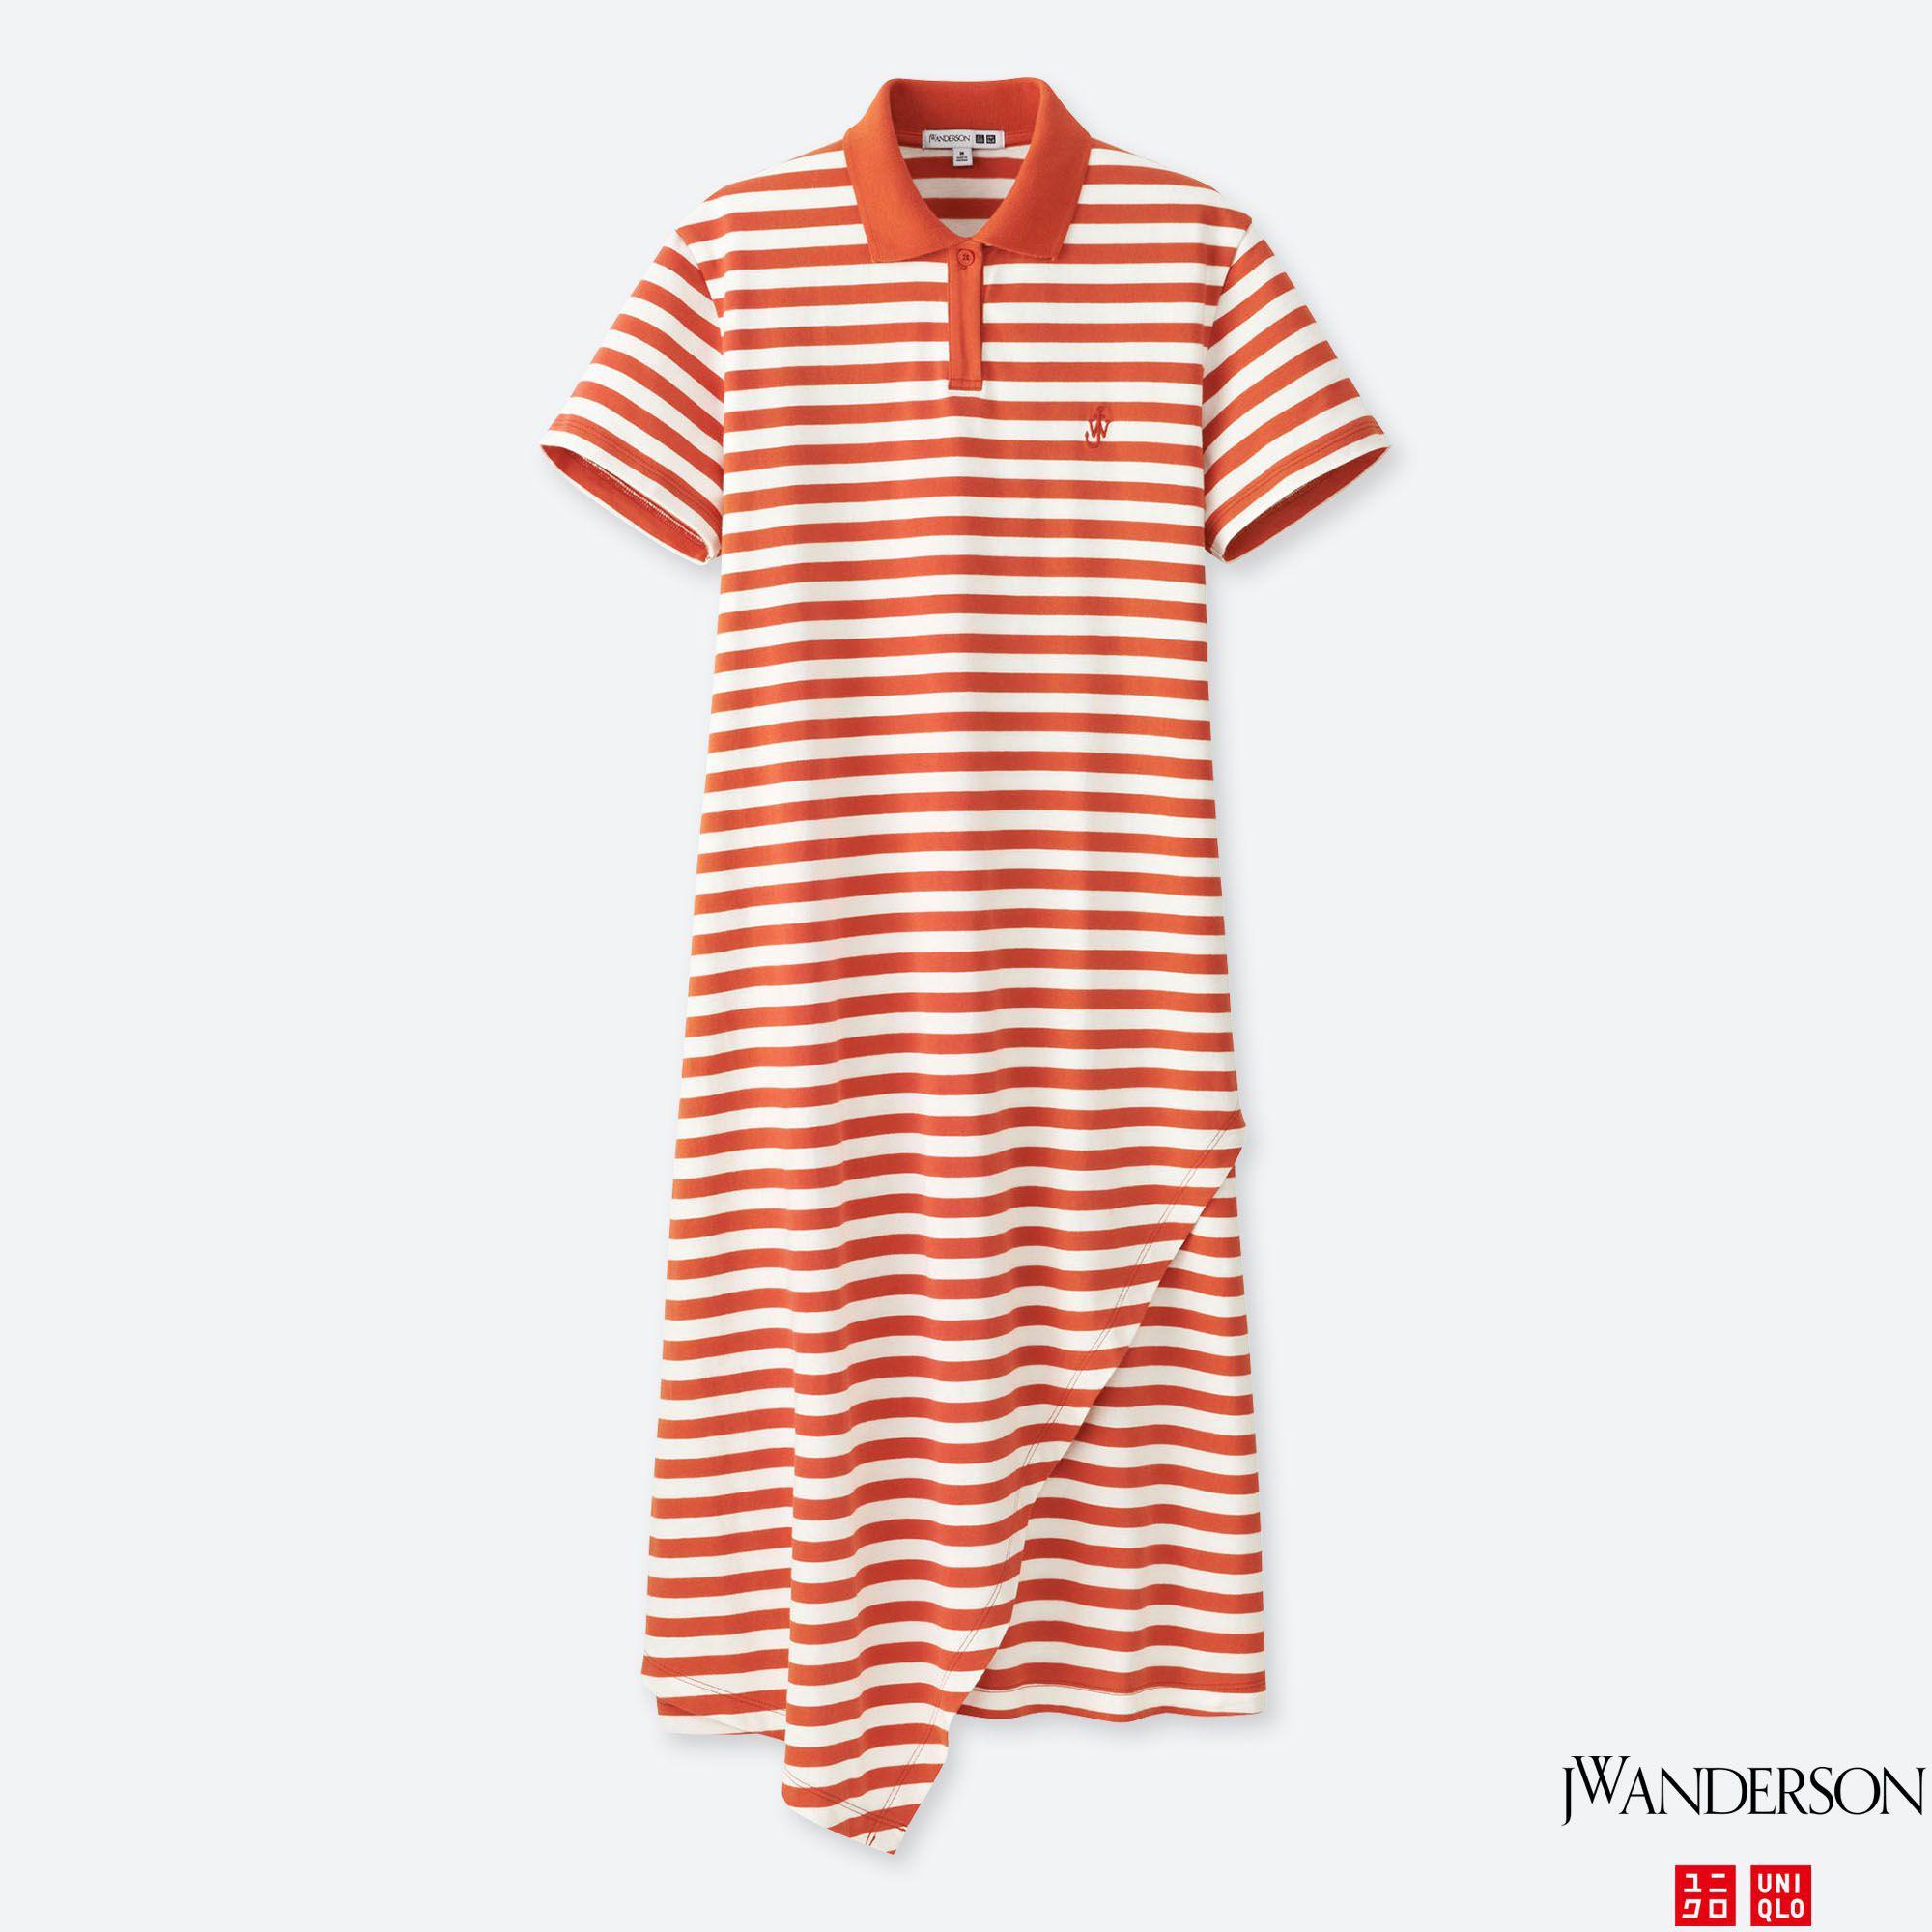 ac63a75e67 Uniqlo Women Jwa Polo Ruffle Dress in Orange - Lyst